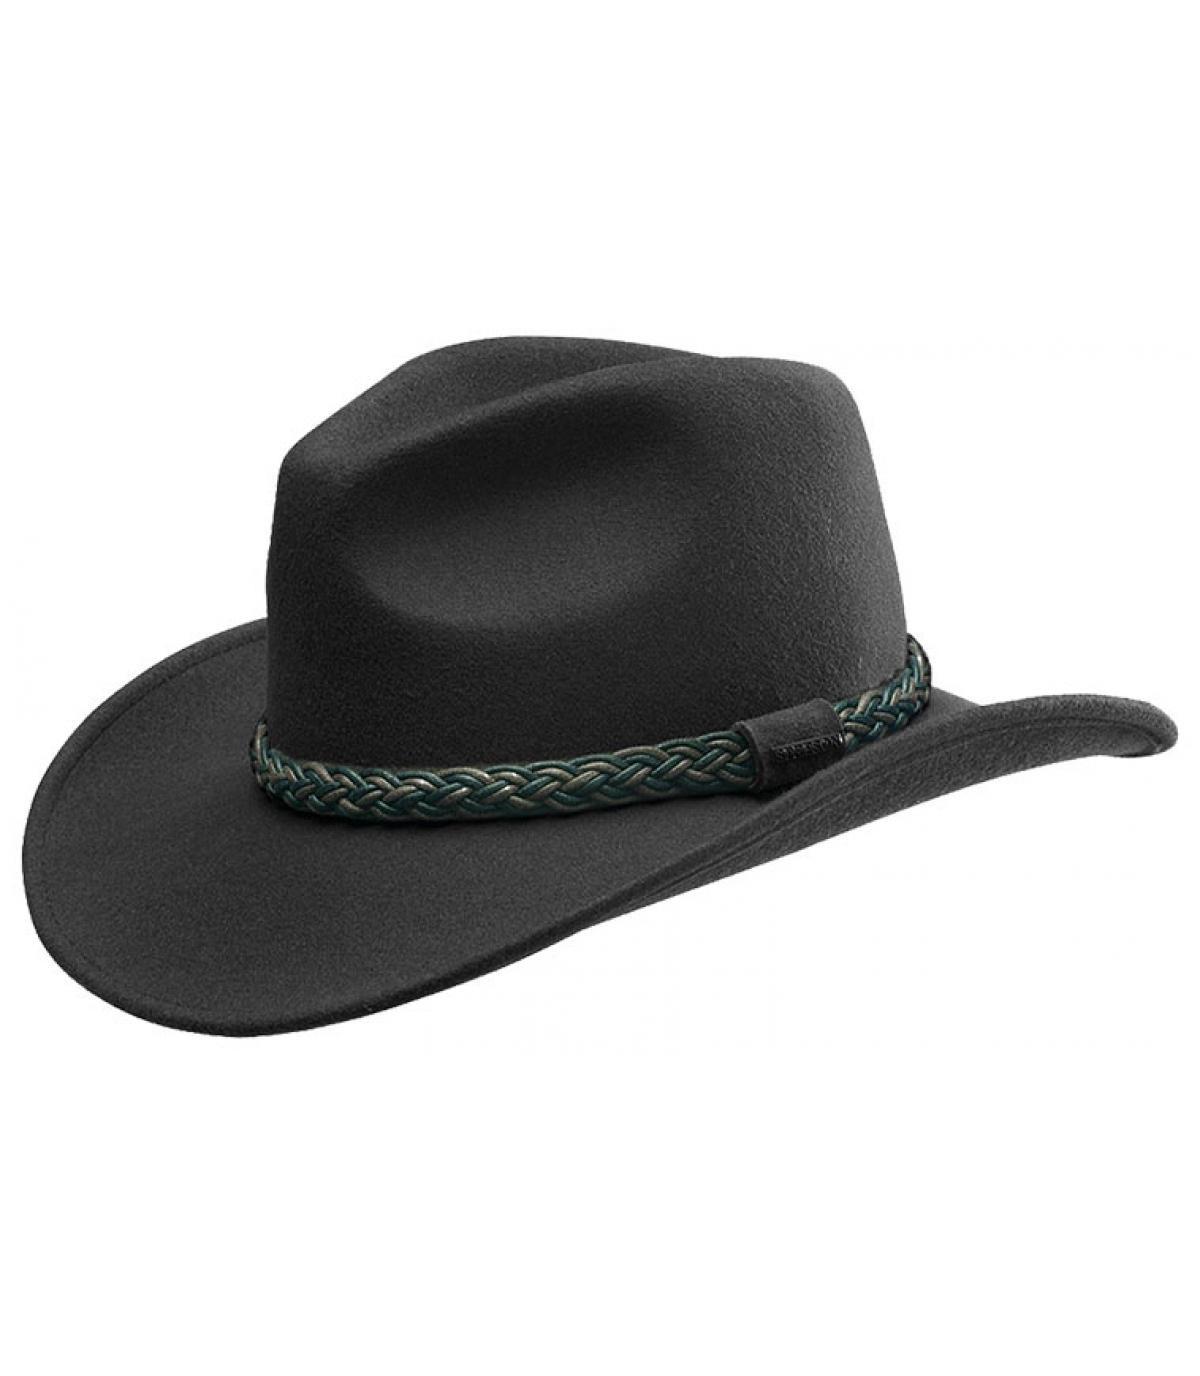 sombrero vaquero negro fieltro - Western Oxnard Woolfelt black Stetson  imagen 1 ... fe7d6bb41e1